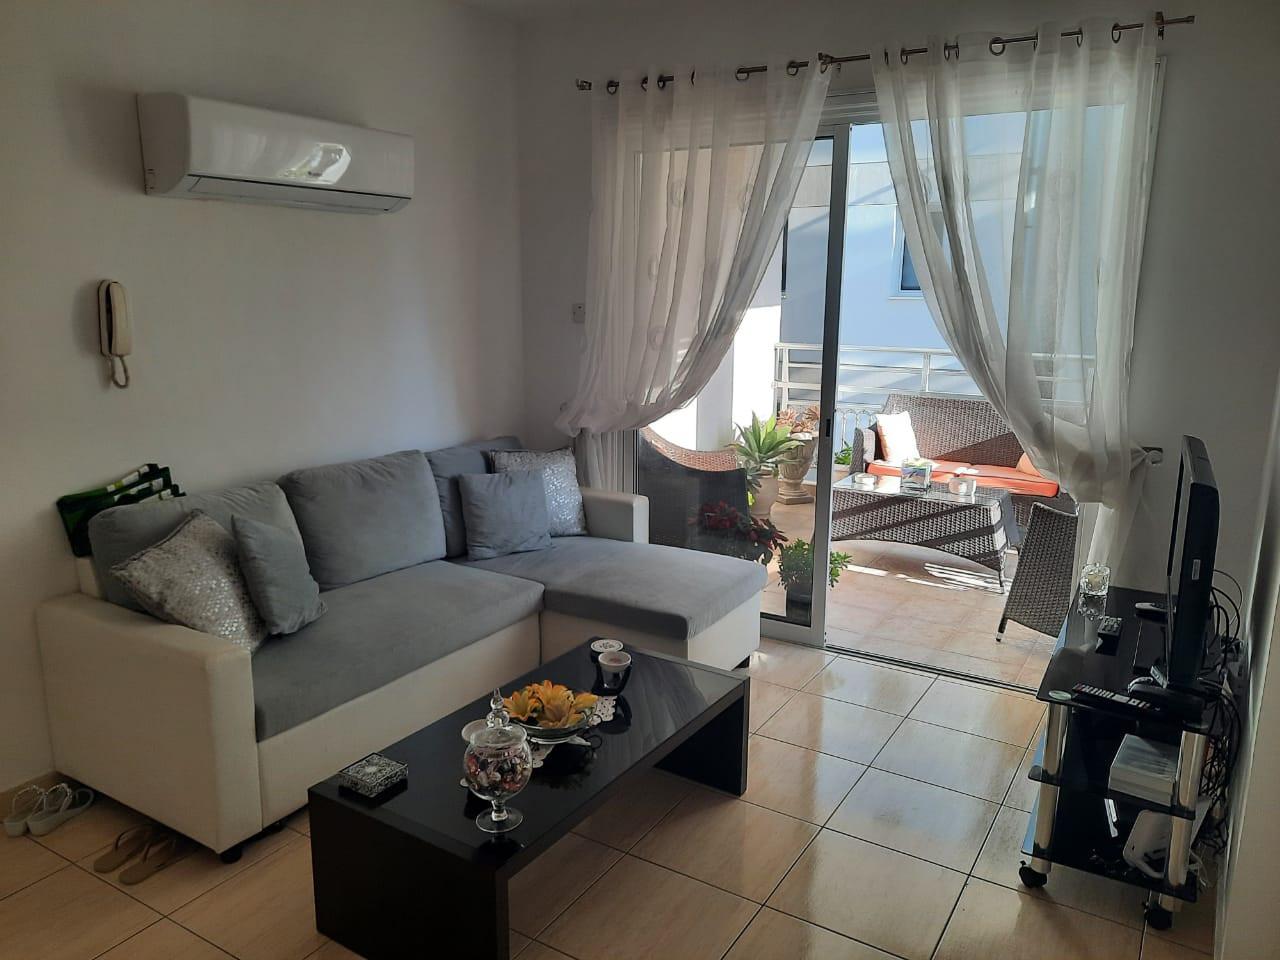 FC-33497: Apartment (Flat) in Mackenzie, Larnaca for Sale - #5